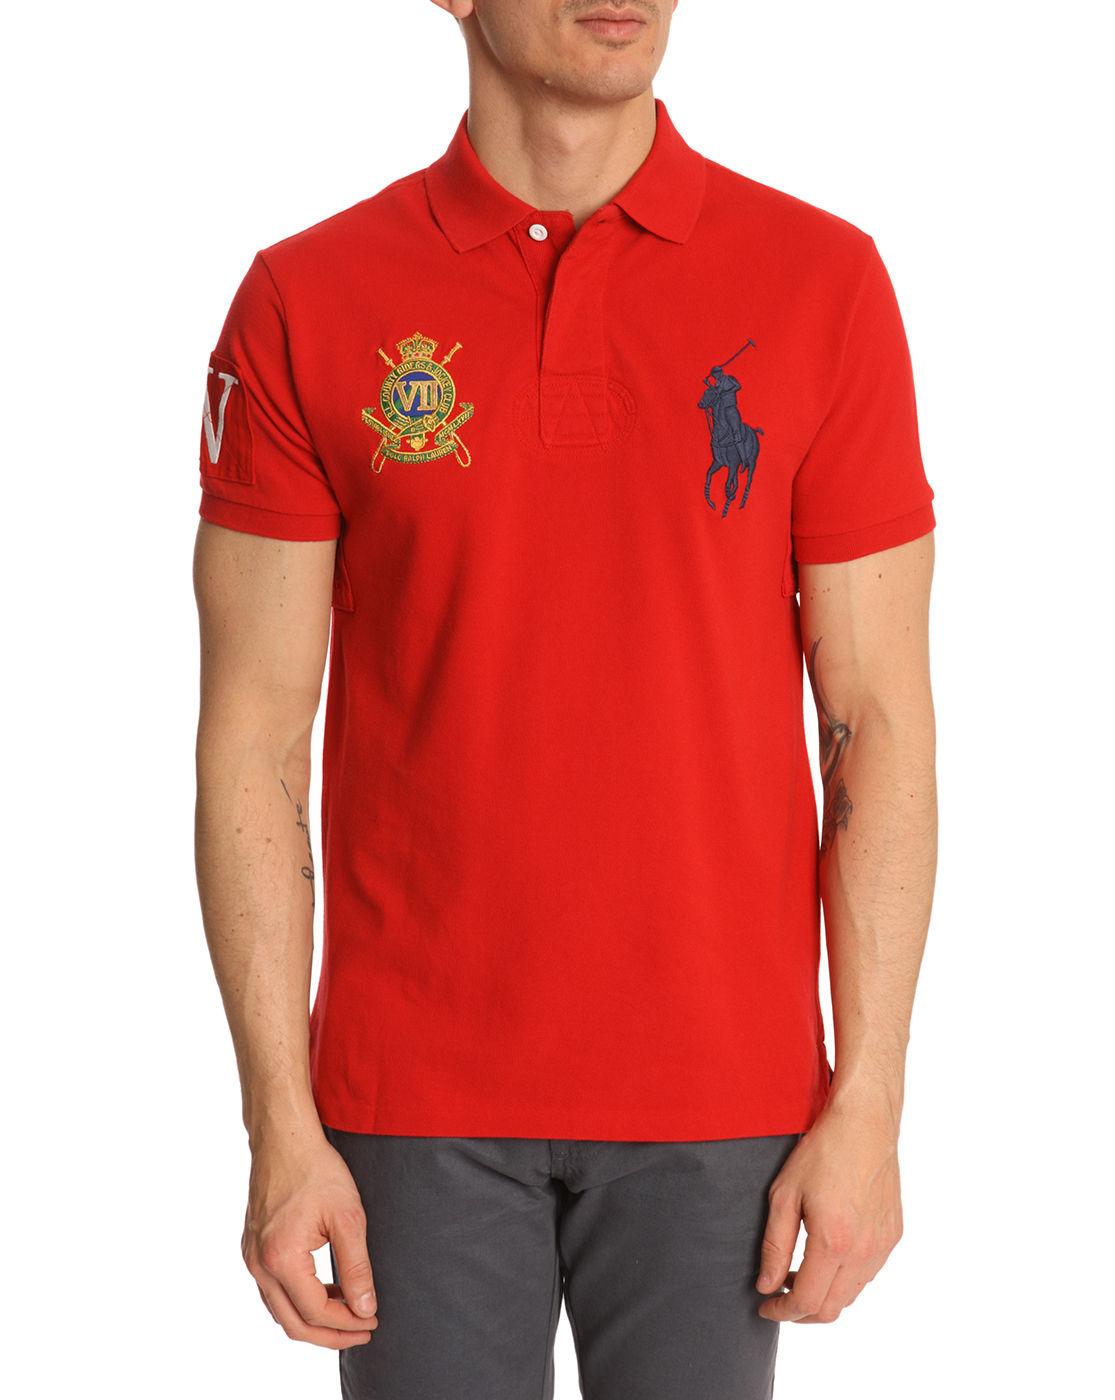 Polo ralph lauren jockey club red slimfit polo shirt in for Ralph lauren polo club shirts